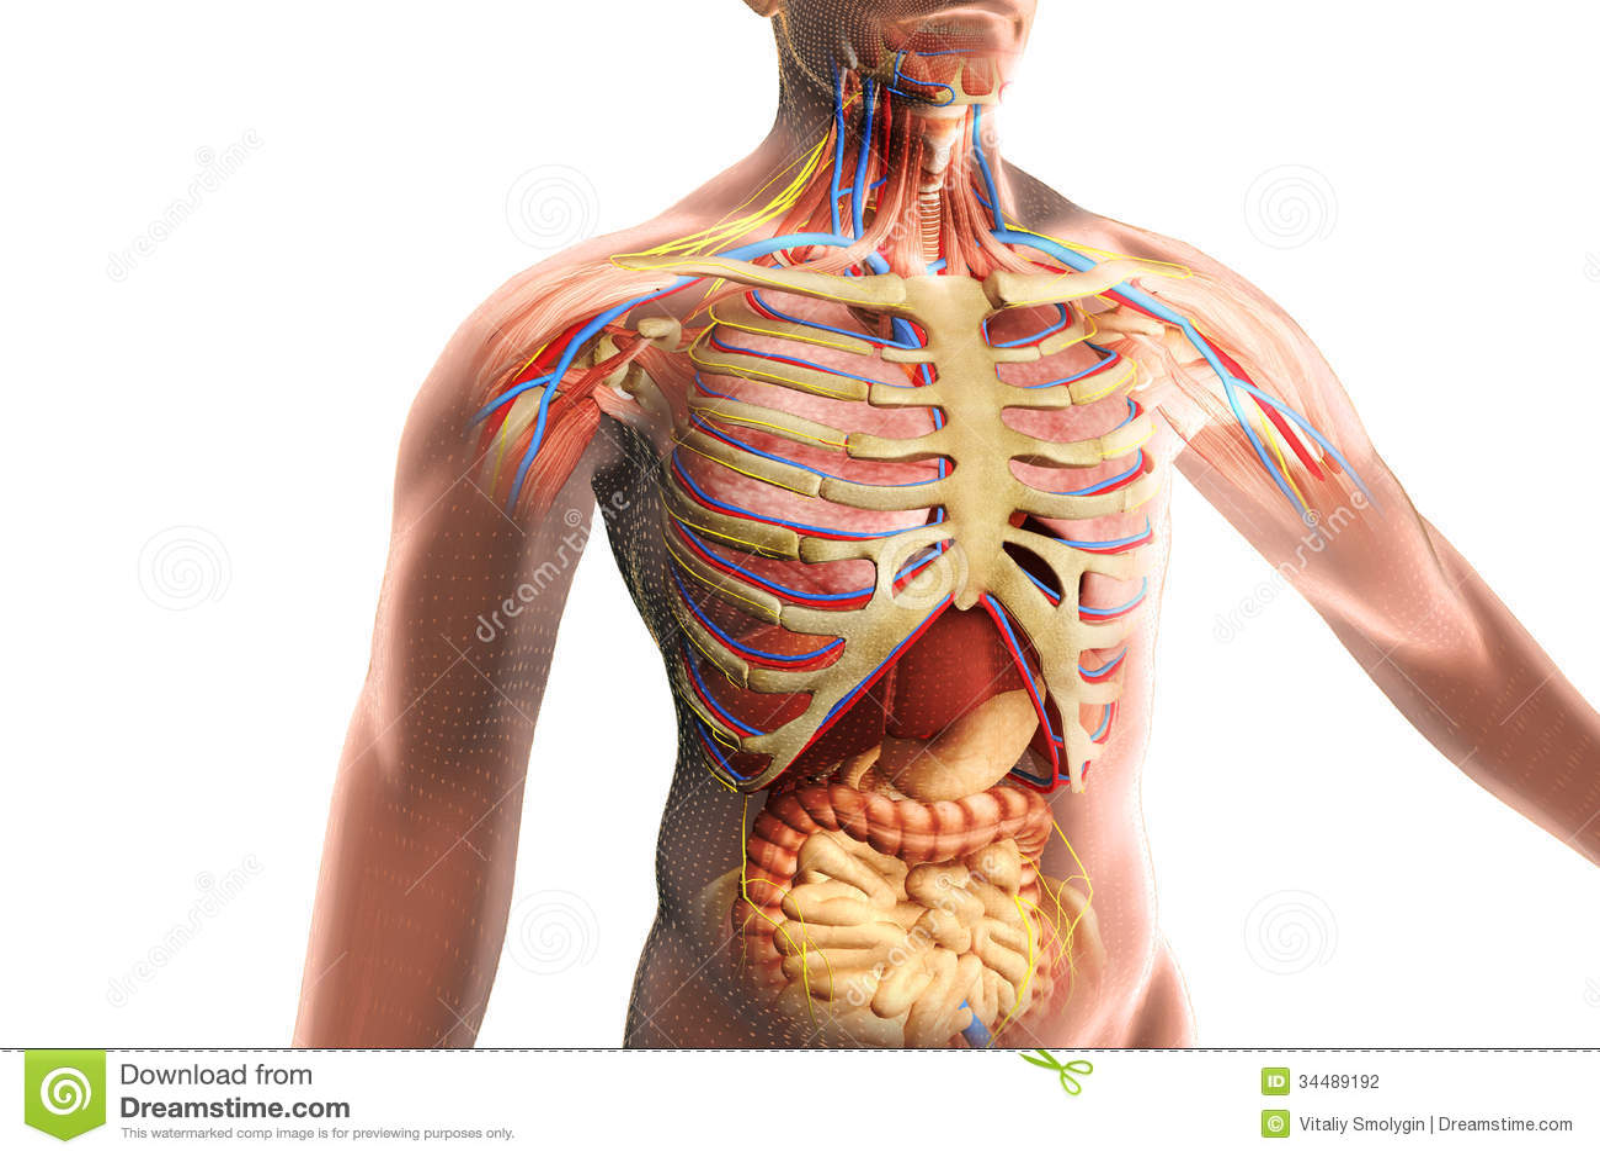 Stock Photography Human Body Anatomy Images Internal Organs Image34489192